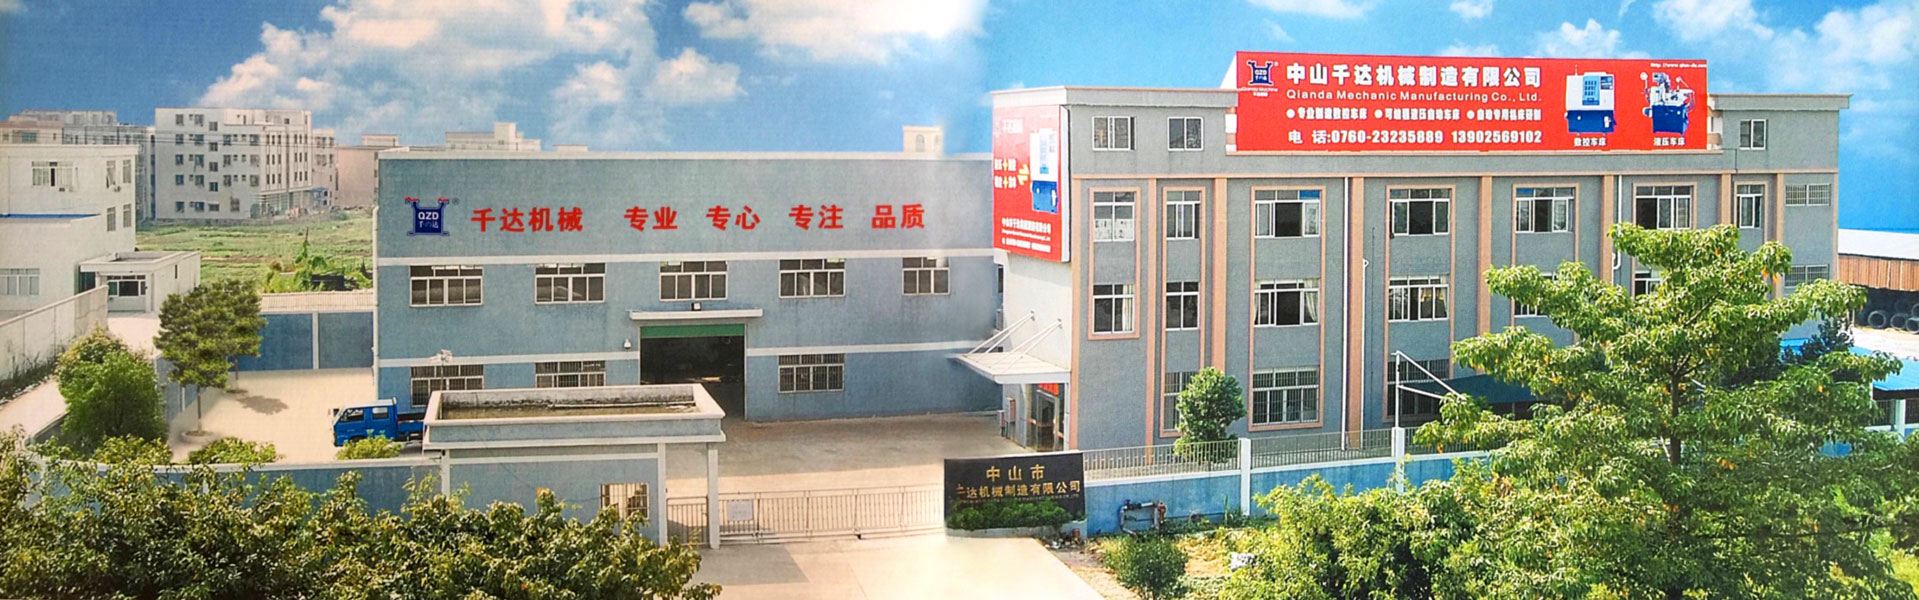 CNC数控车床厂家